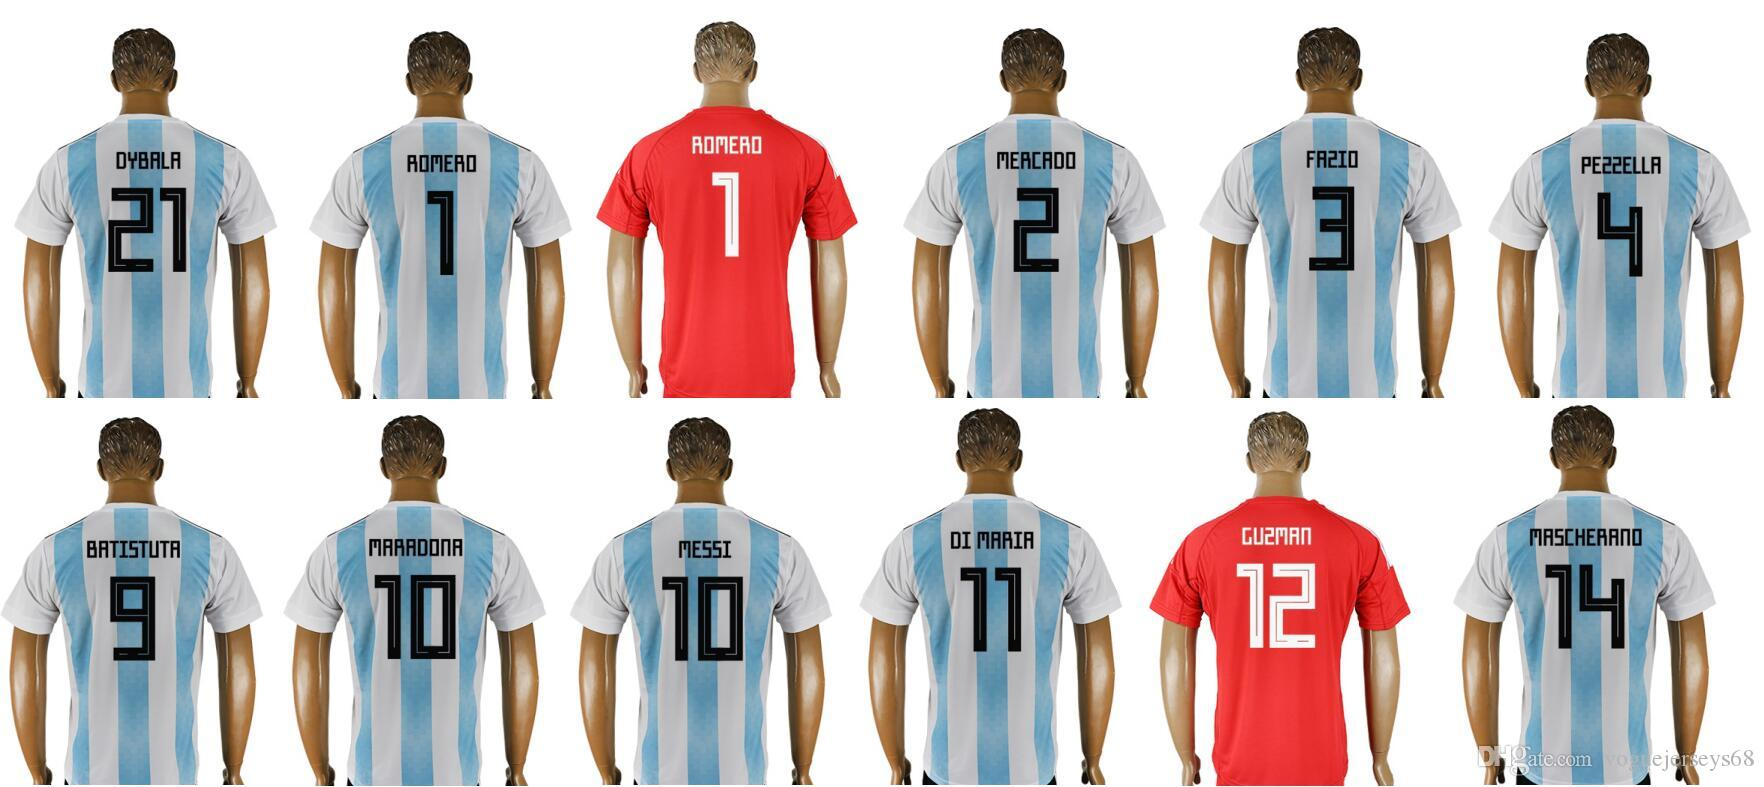 Compre Mens 2018 Argentina Equipe   1 Sergio Romero Diego Maradona 9  Gabriel Batistuta 10 Uniformes Lionel Messi Camisas Sports Soccer Jerseys  Barato De ... 624295cad8b93